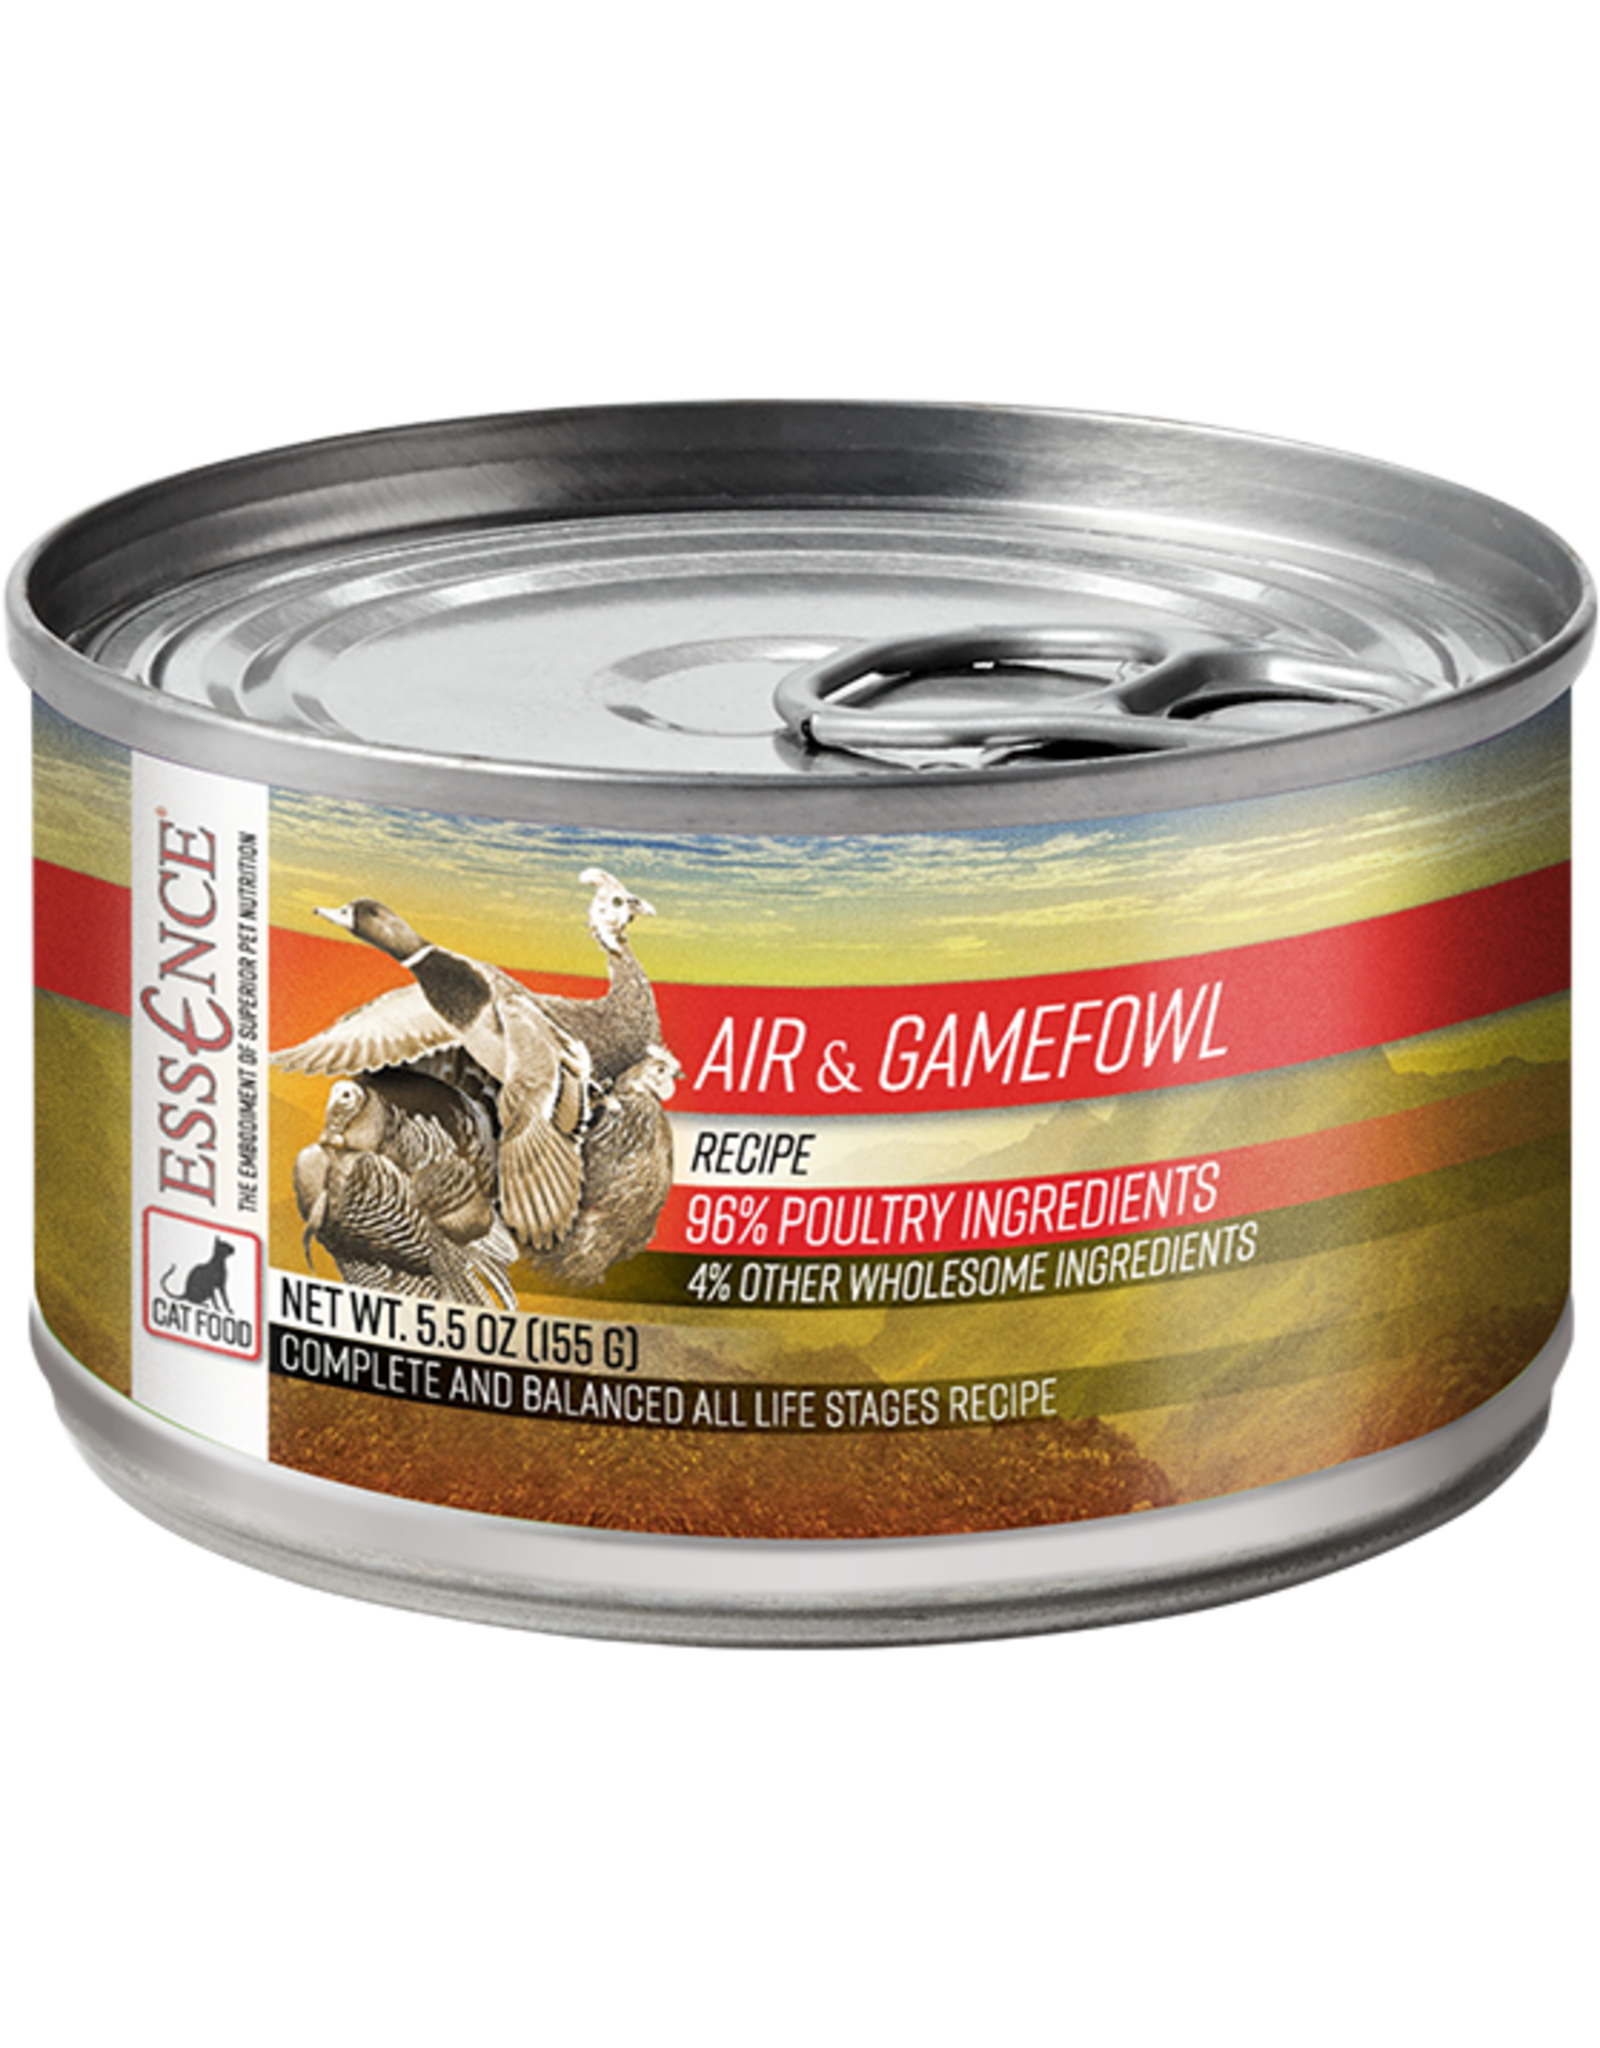 Essence Essence Air & Gamefowl Recipe Cat Food 5.5oz